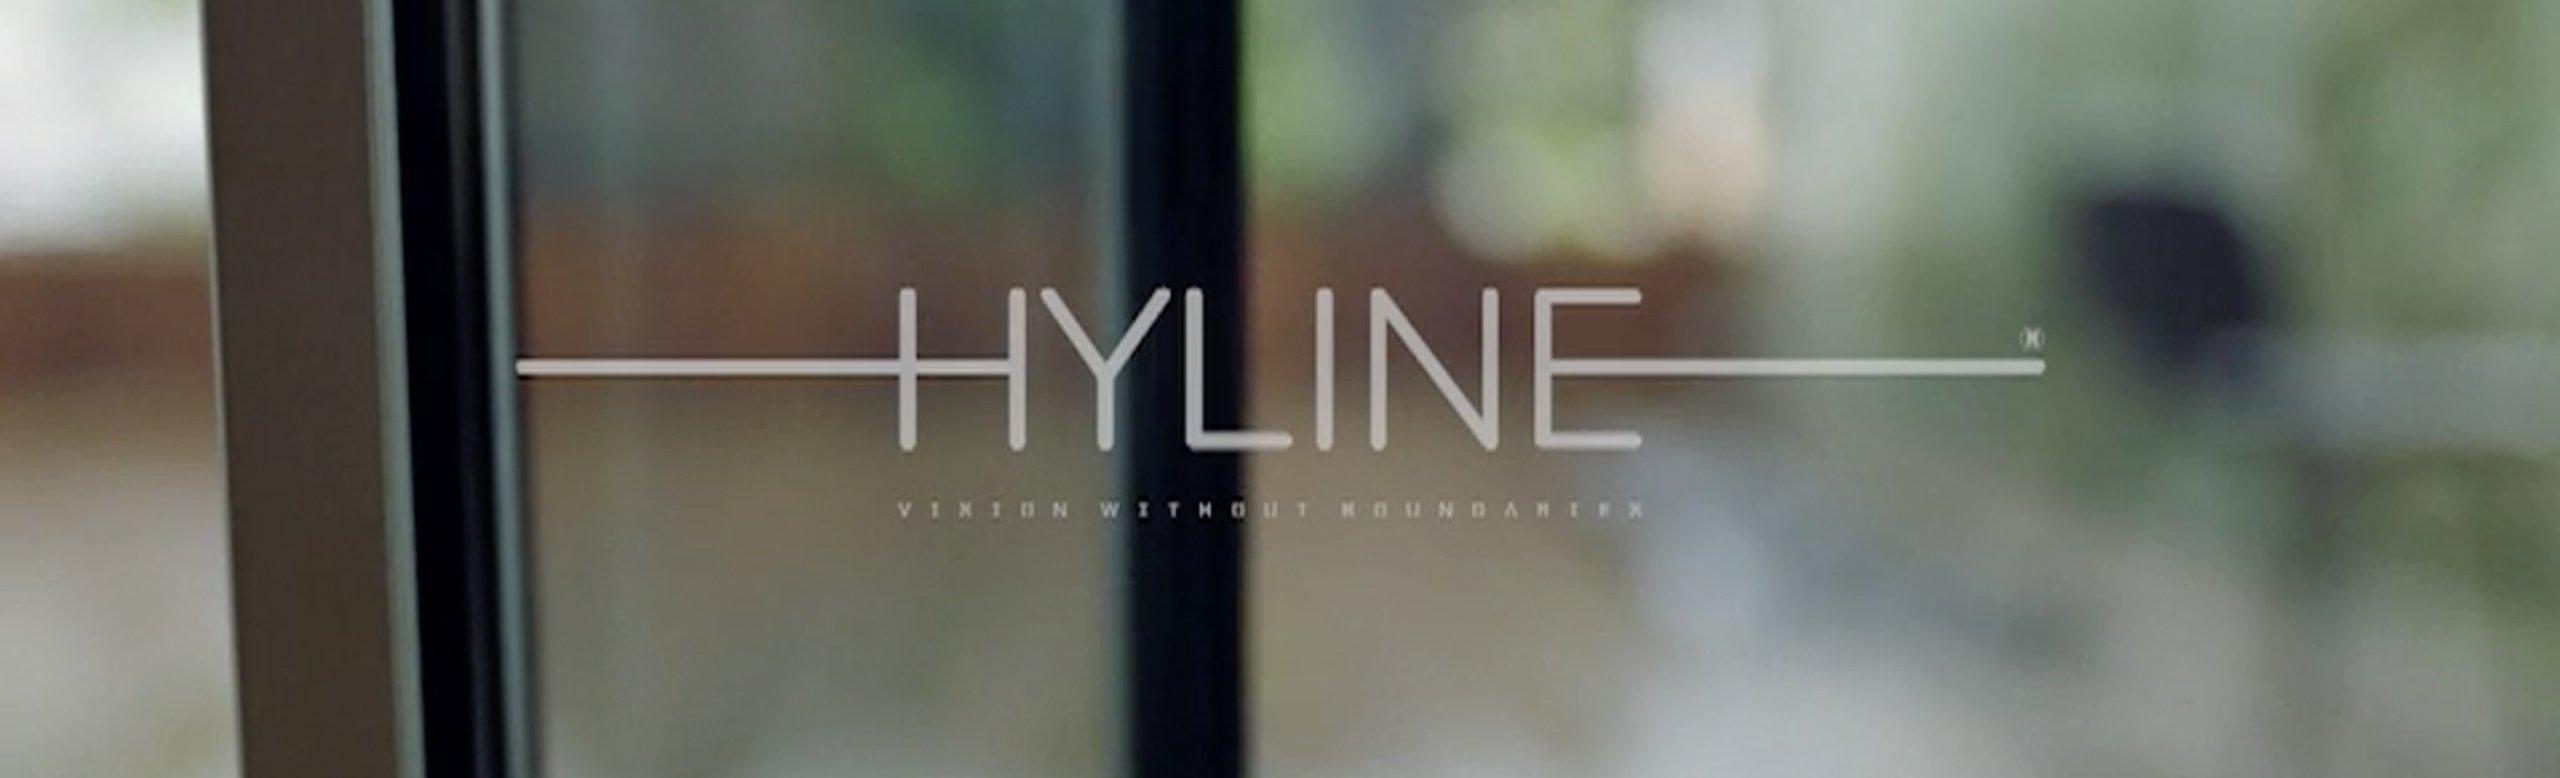 logo hyline